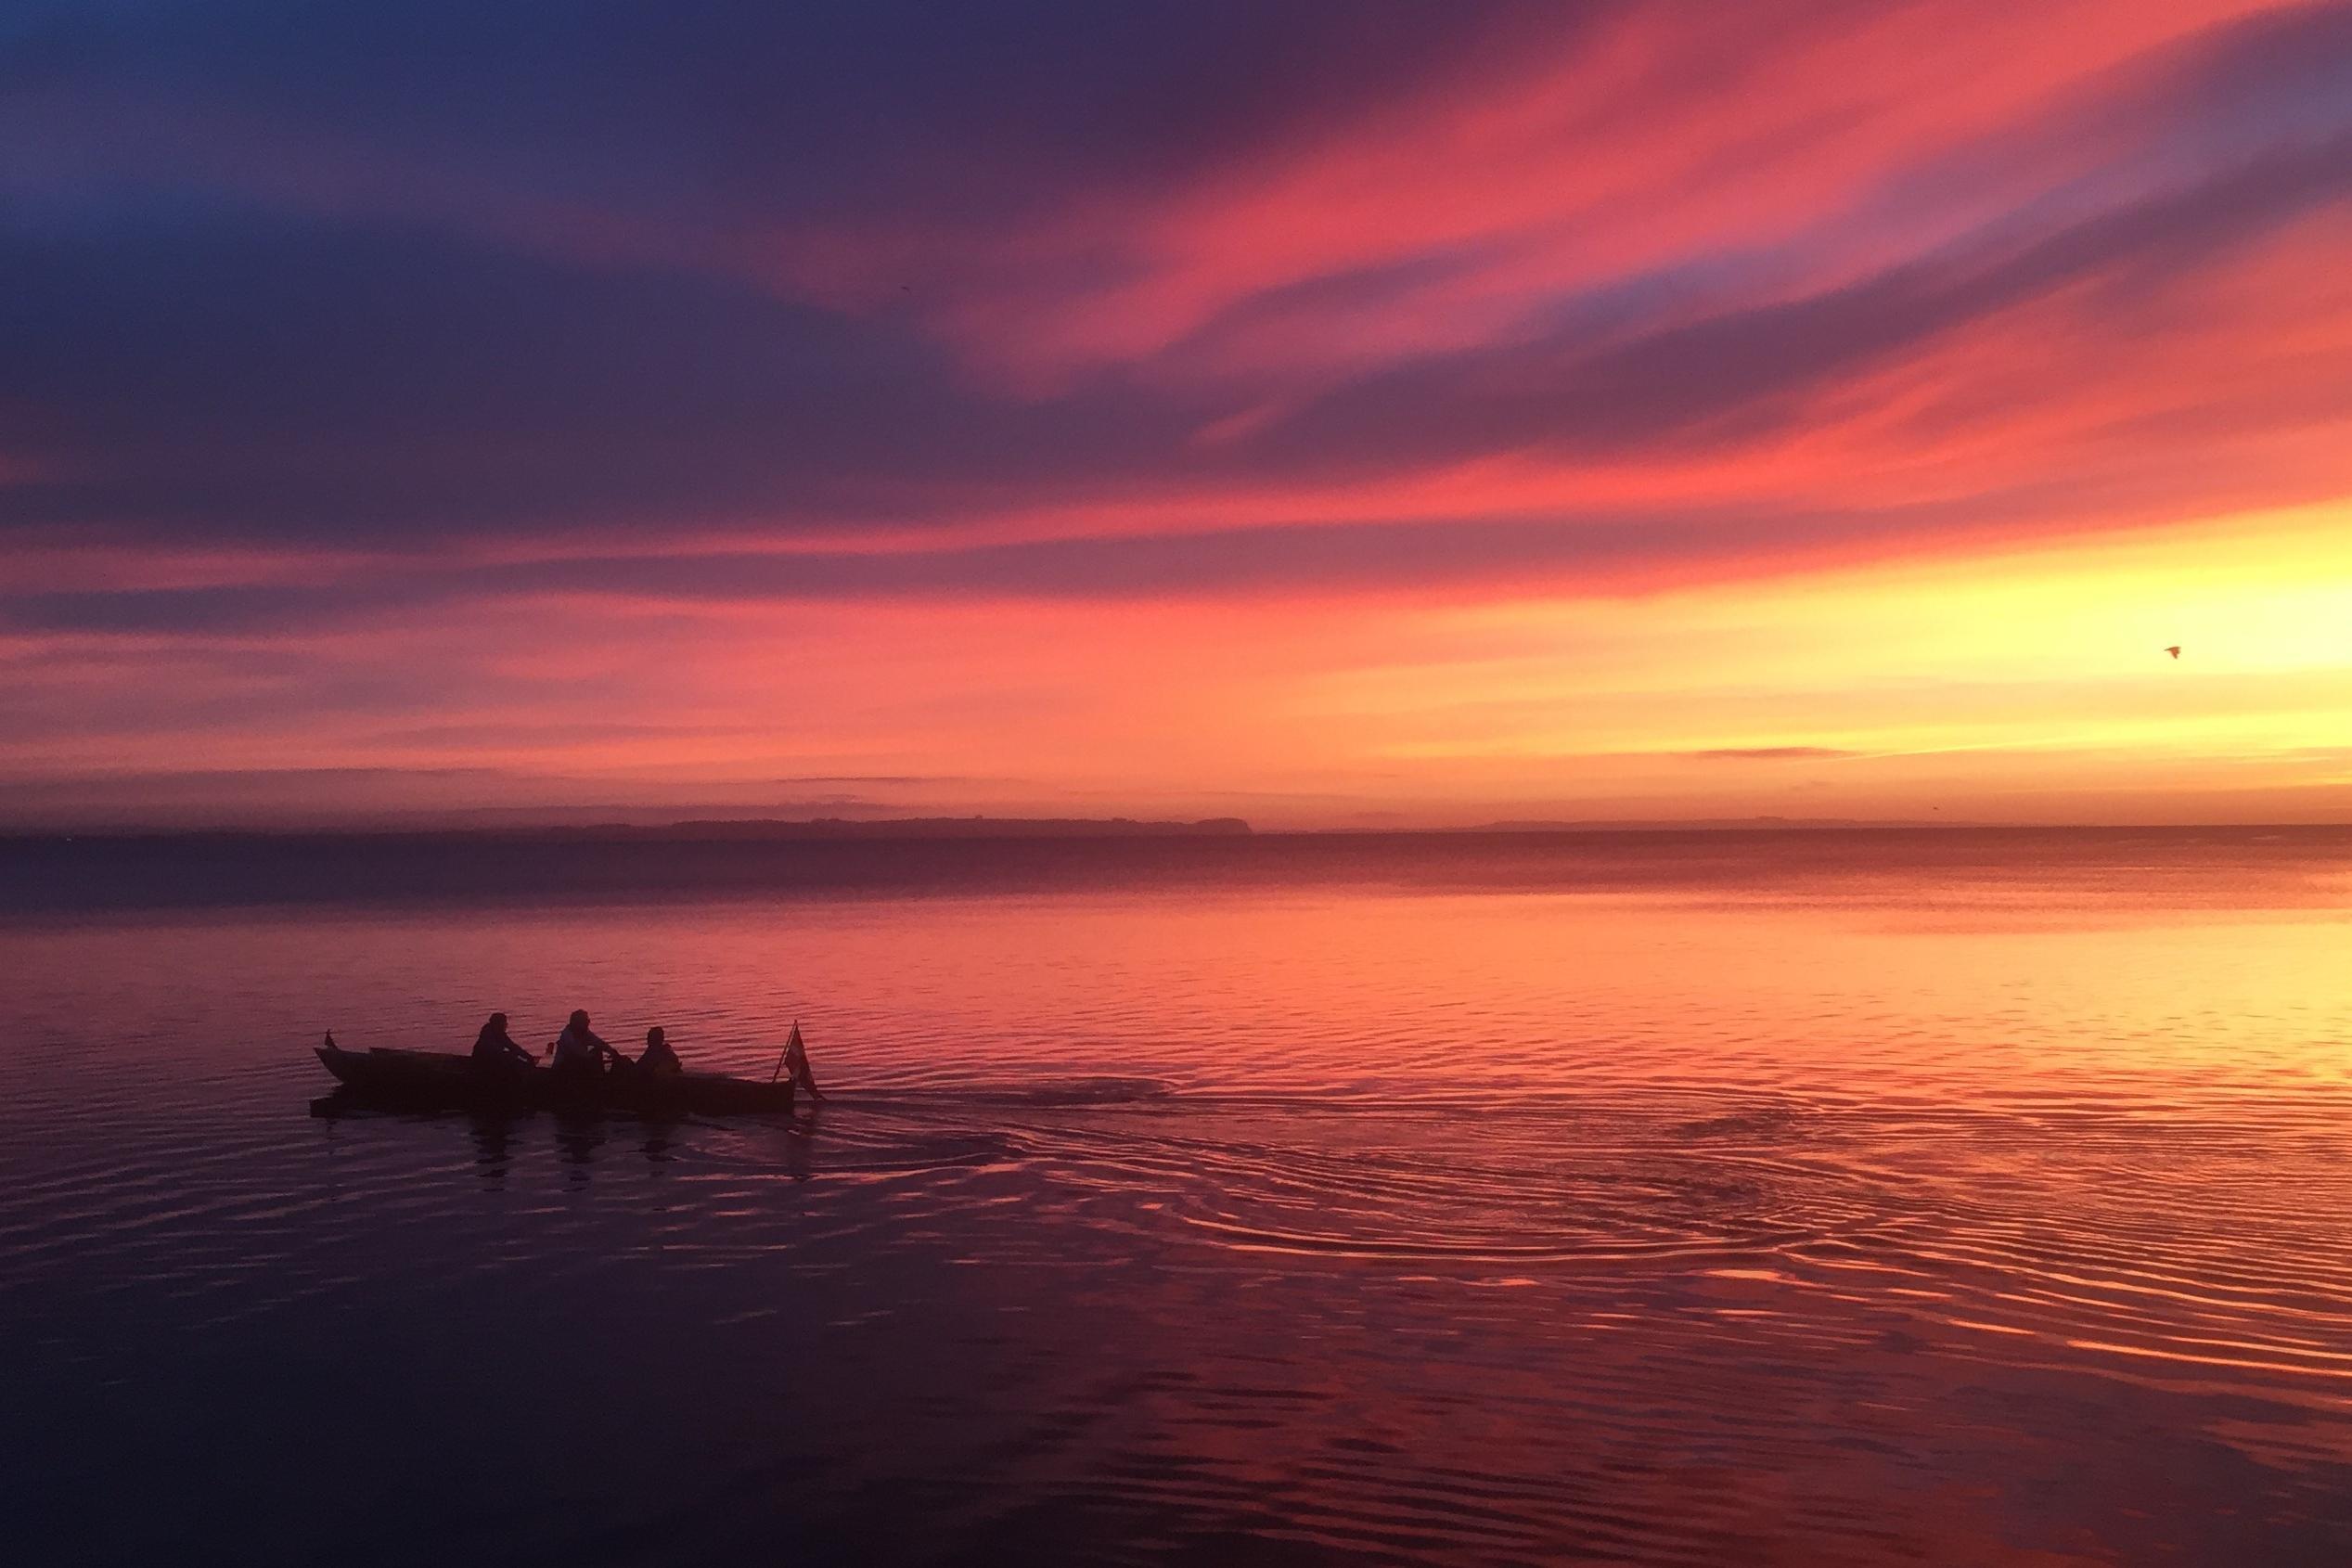 Aarhus bugt i solopgangen